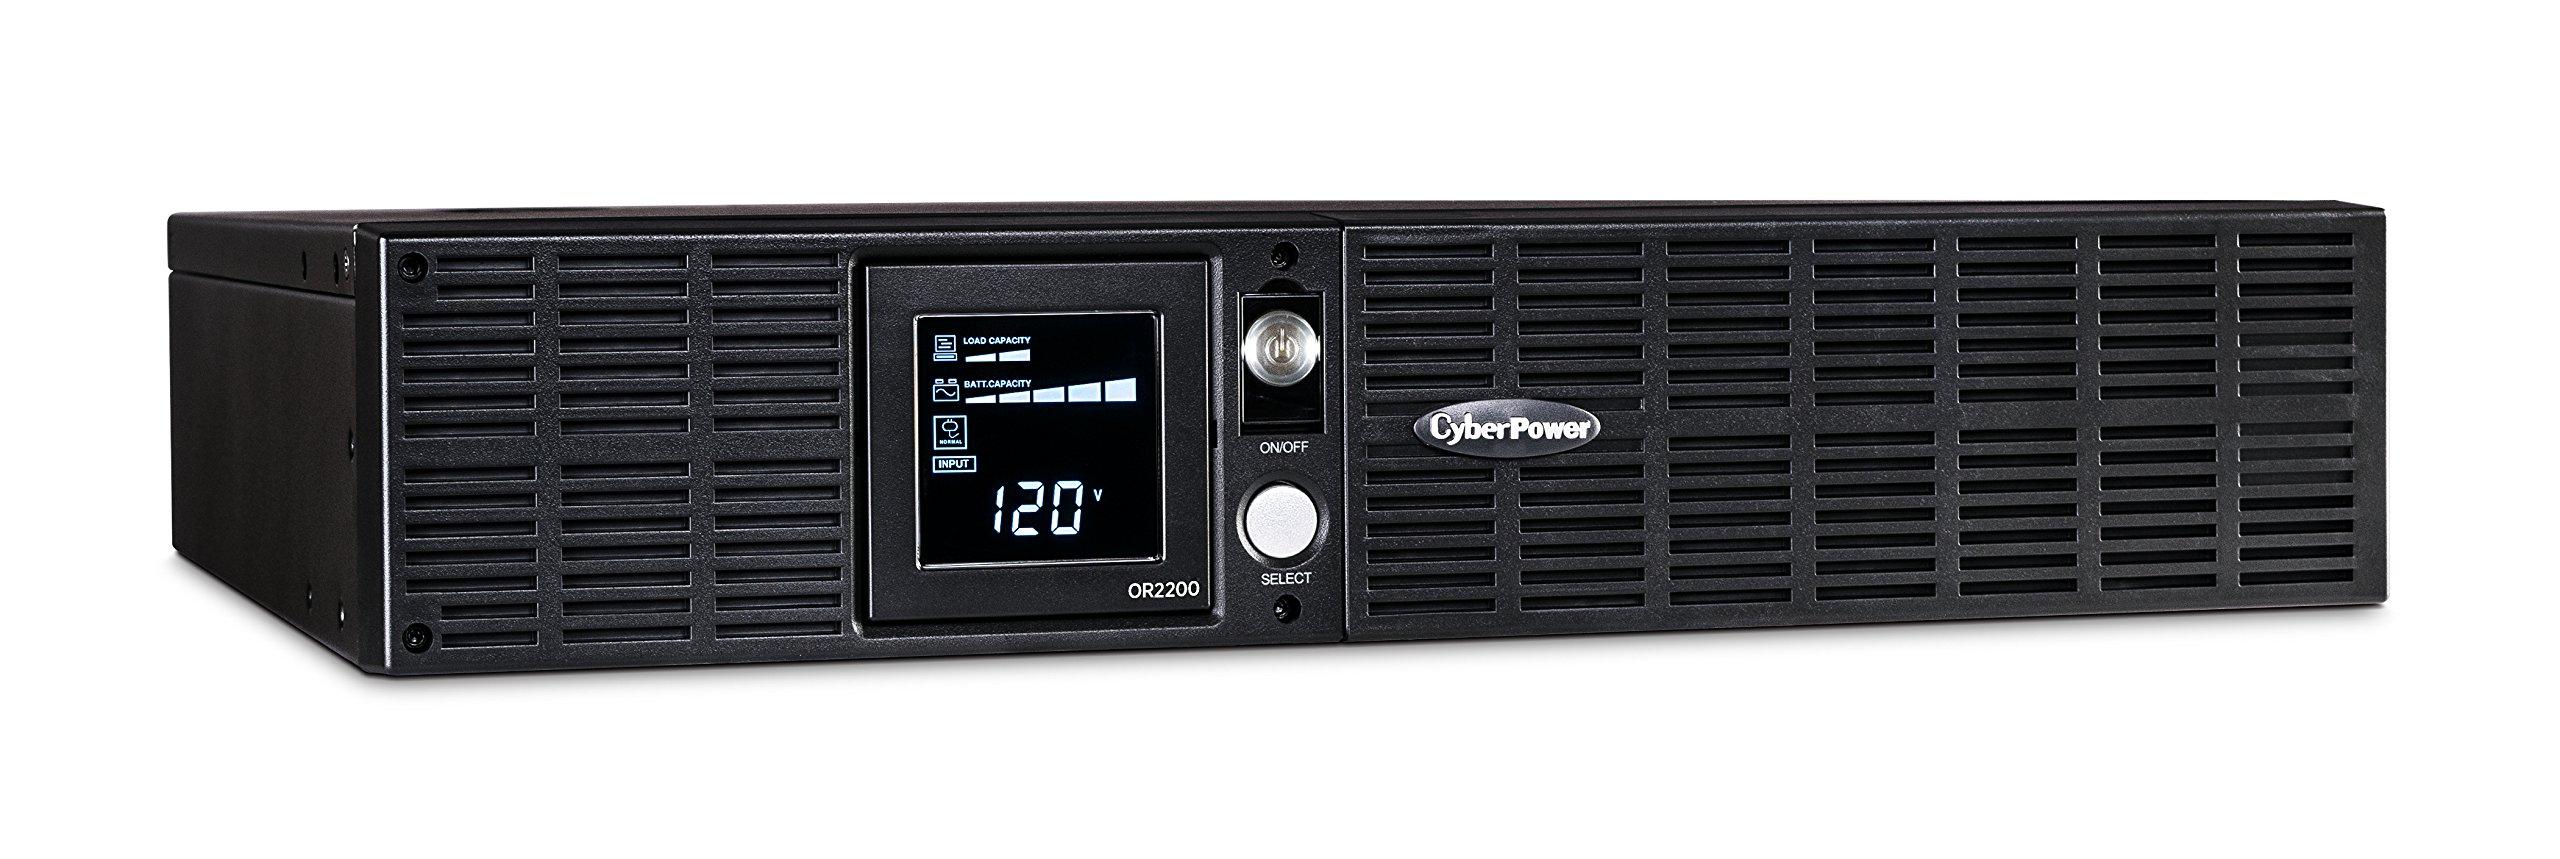 CyberPower OR2200LCDRT2U Smart App LCD UPS System, 2200VA/1320W, 8 Outlets, AVR, 2U Rack/Tower by CyberPower